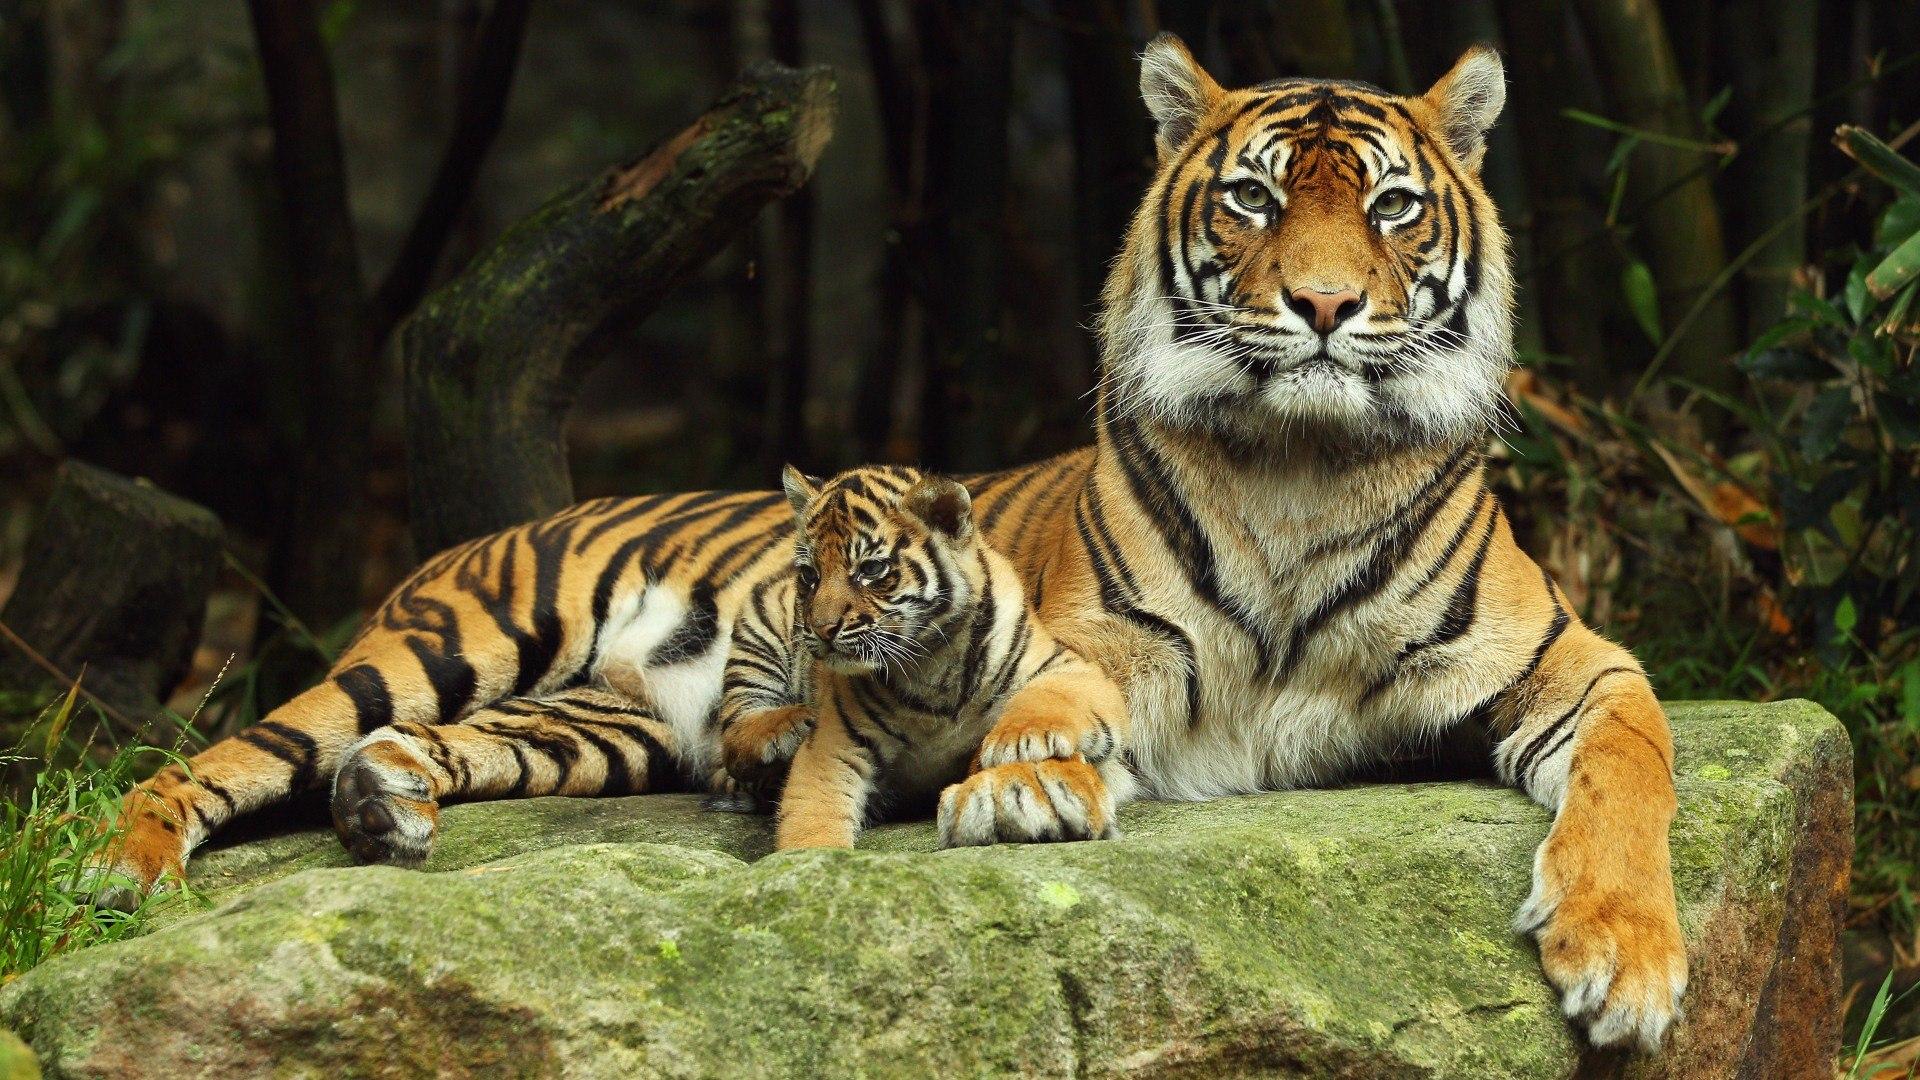 Фото с Тигром на рабочий стол